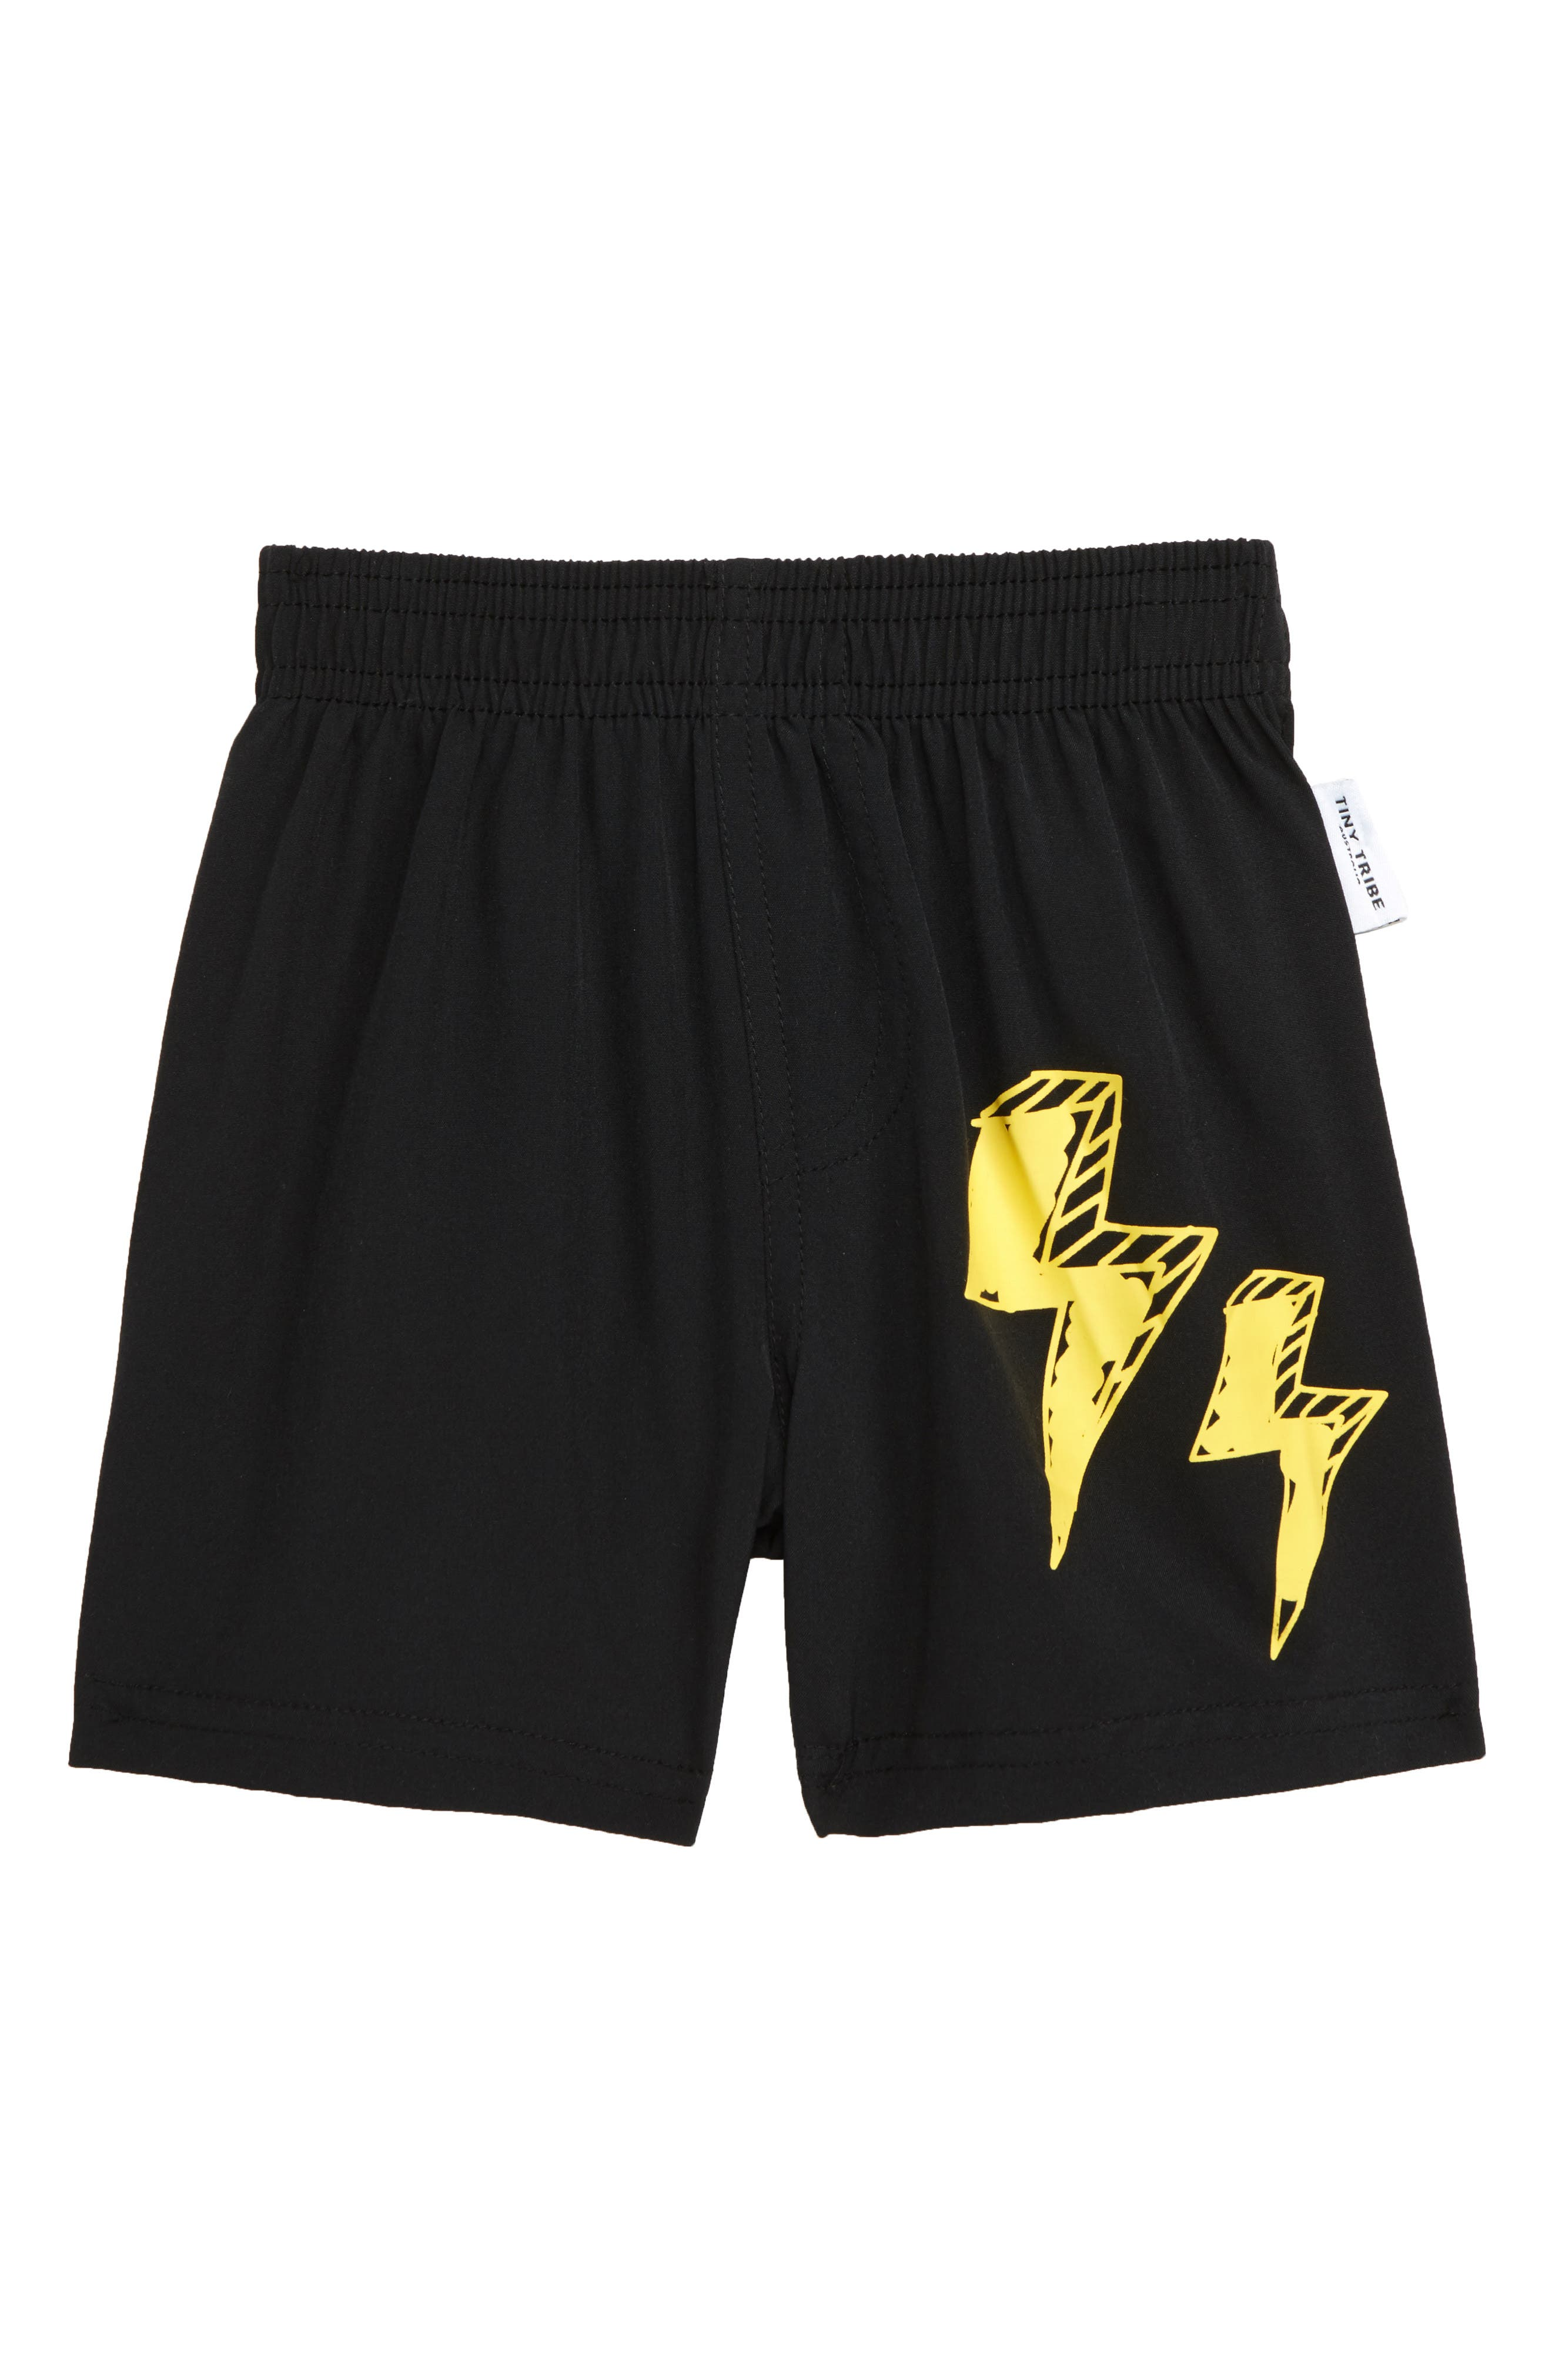 TINY TRIBE, Lightning Board Shorts, Main thumbnail 1, color, BLACK